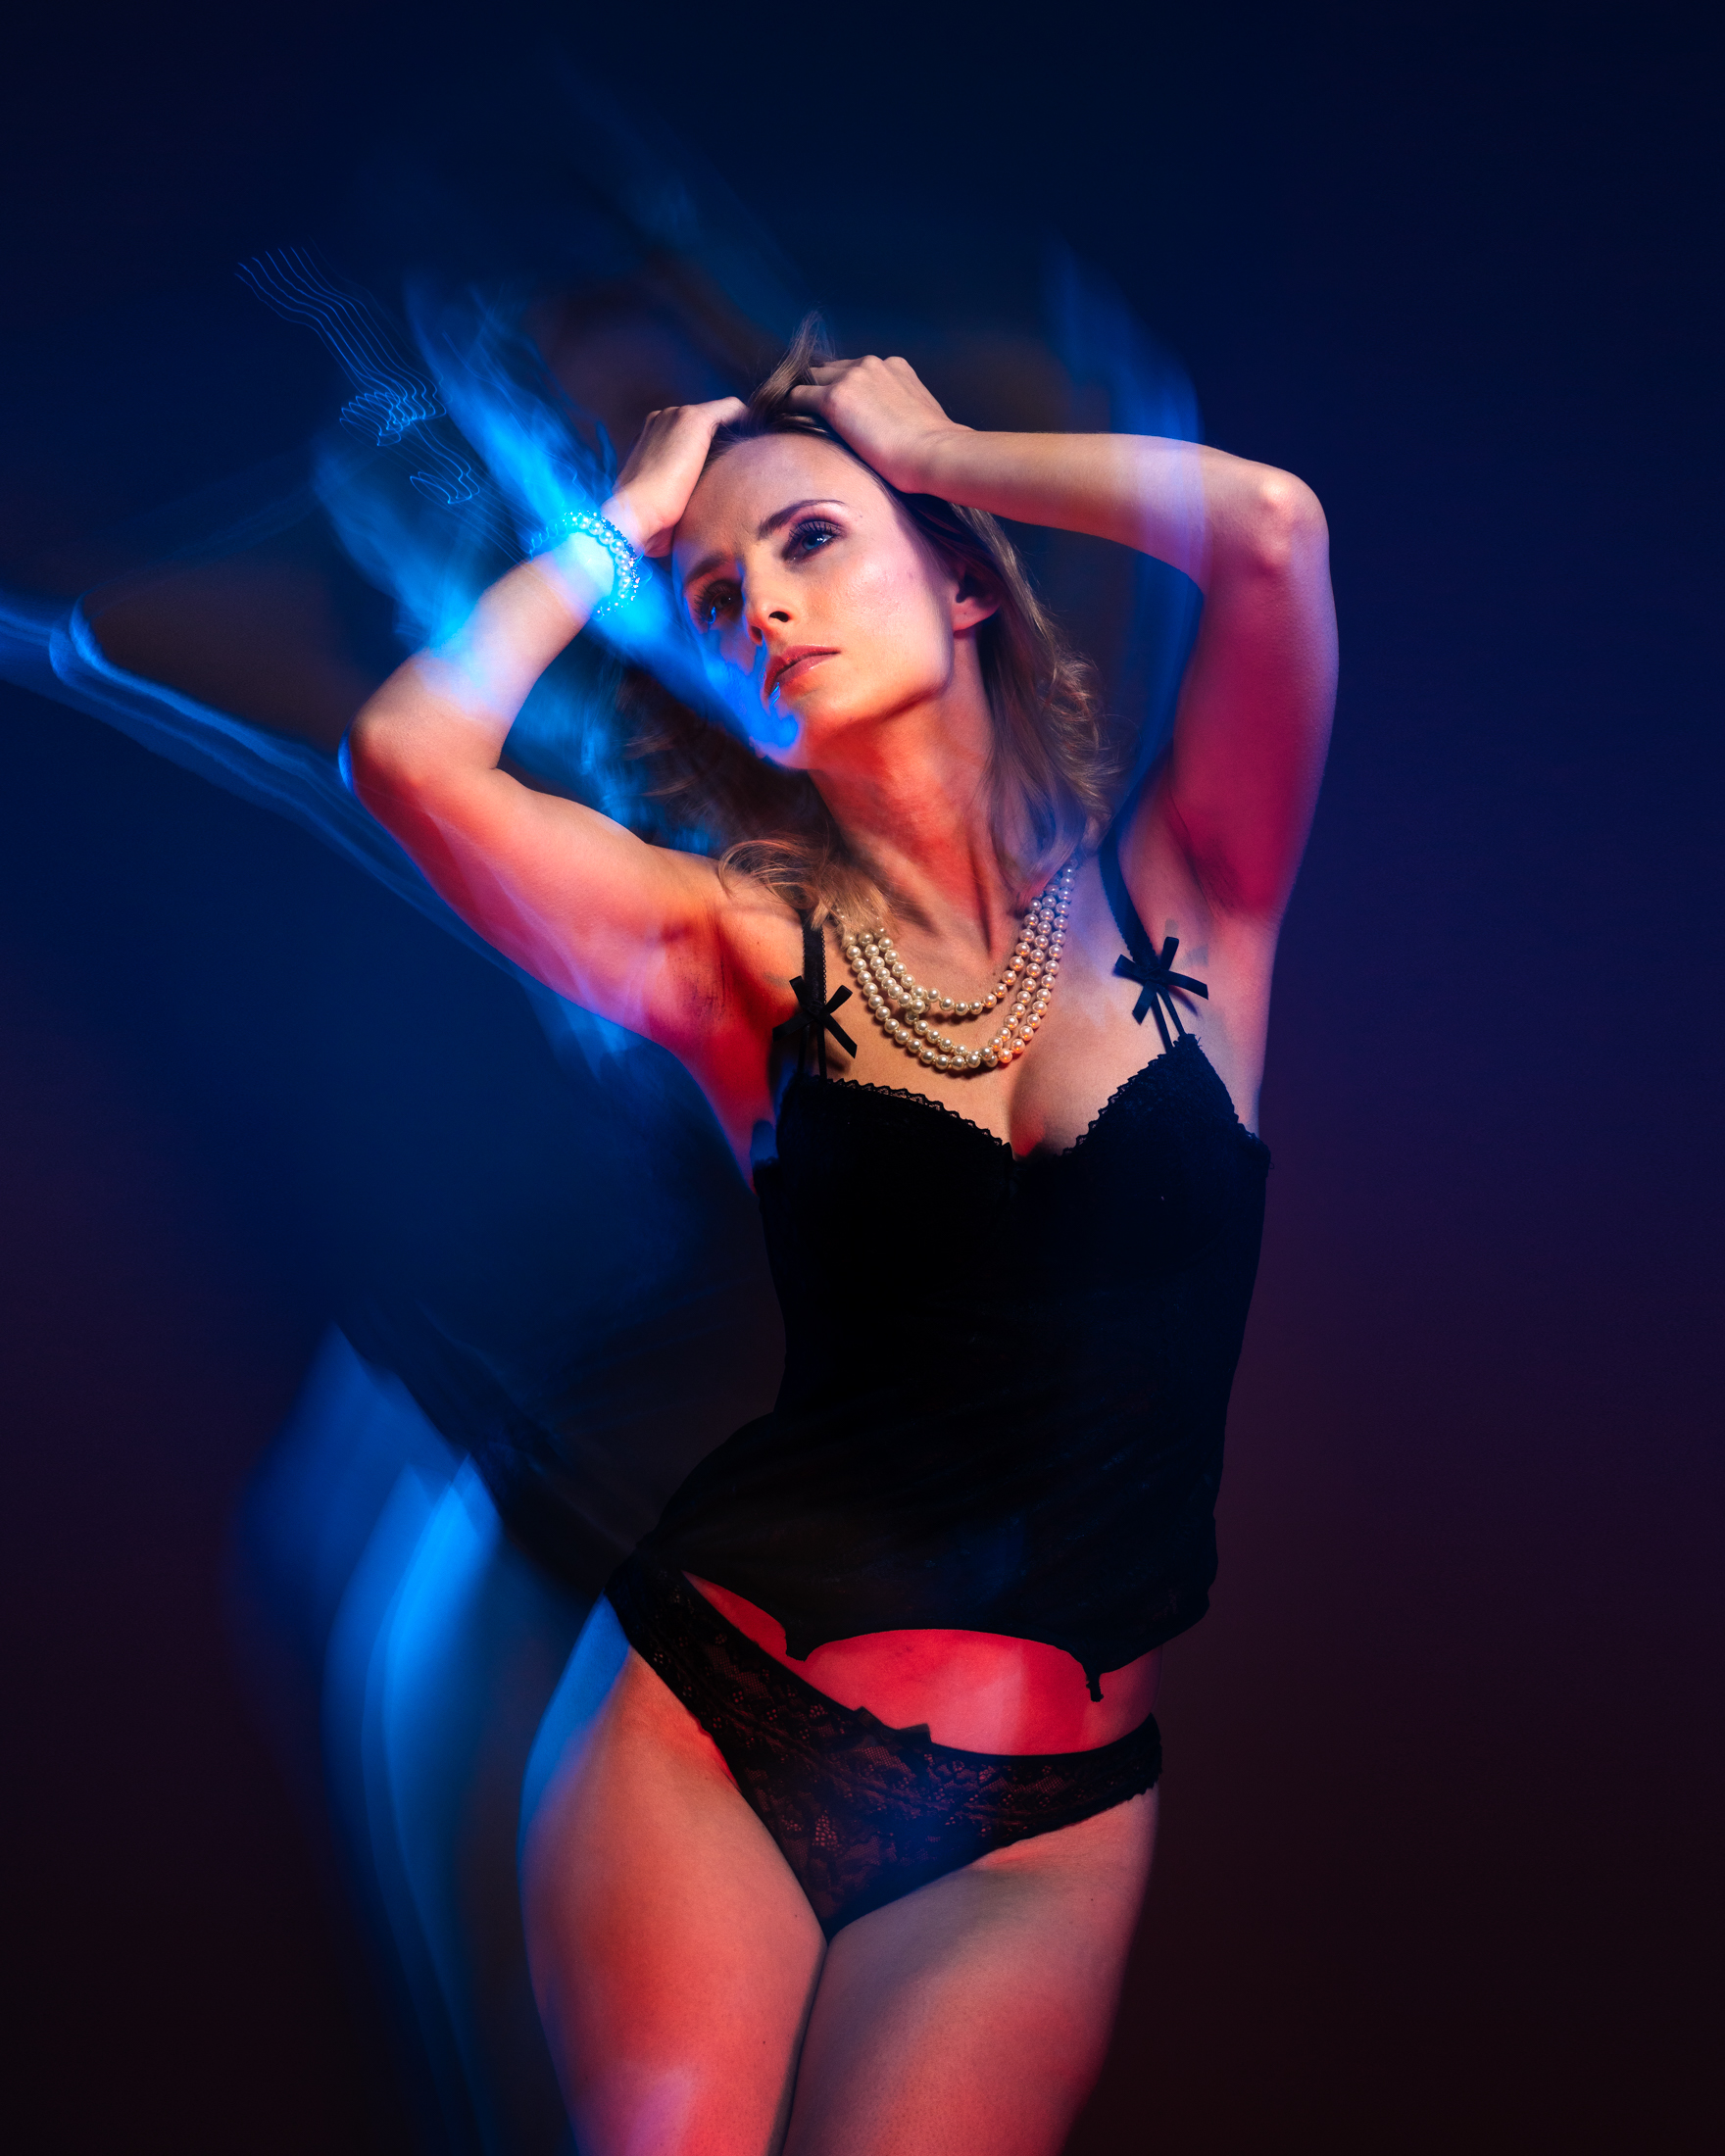 veronika sensual portrait with color gels in studio in frankfurt 03